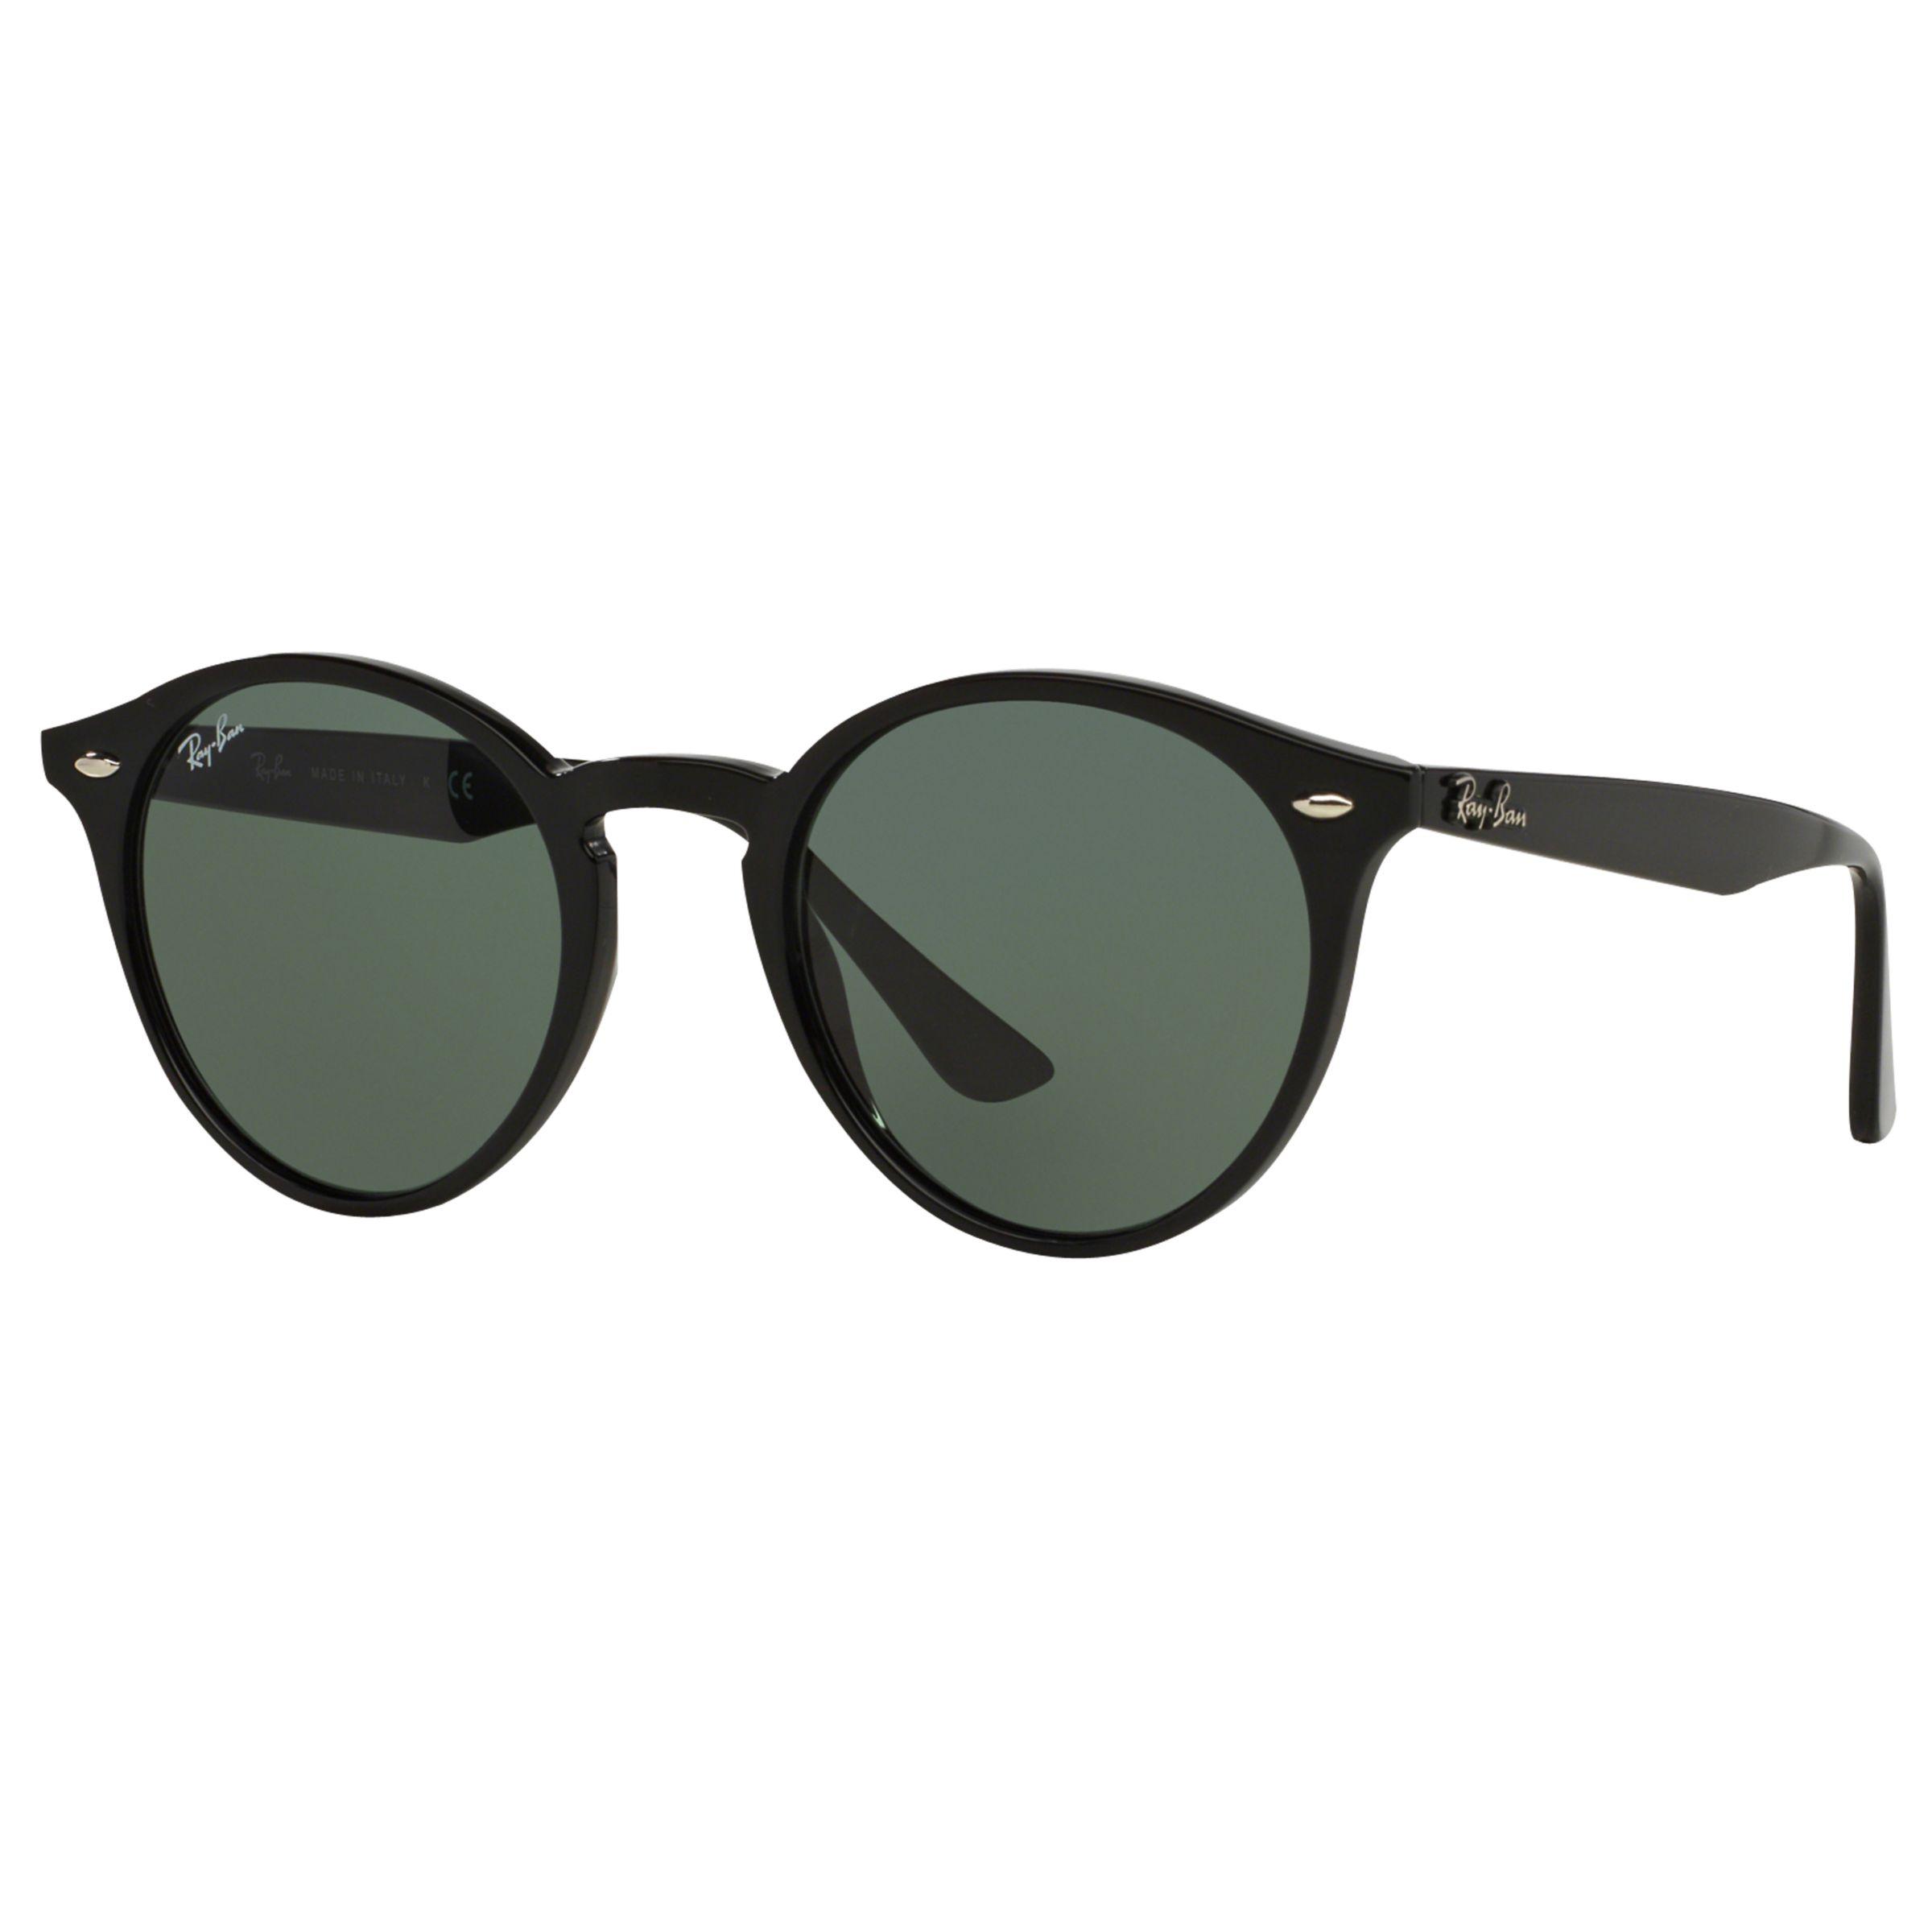 Ray-ban Ray-Ban RB2180 Round Sunglasses